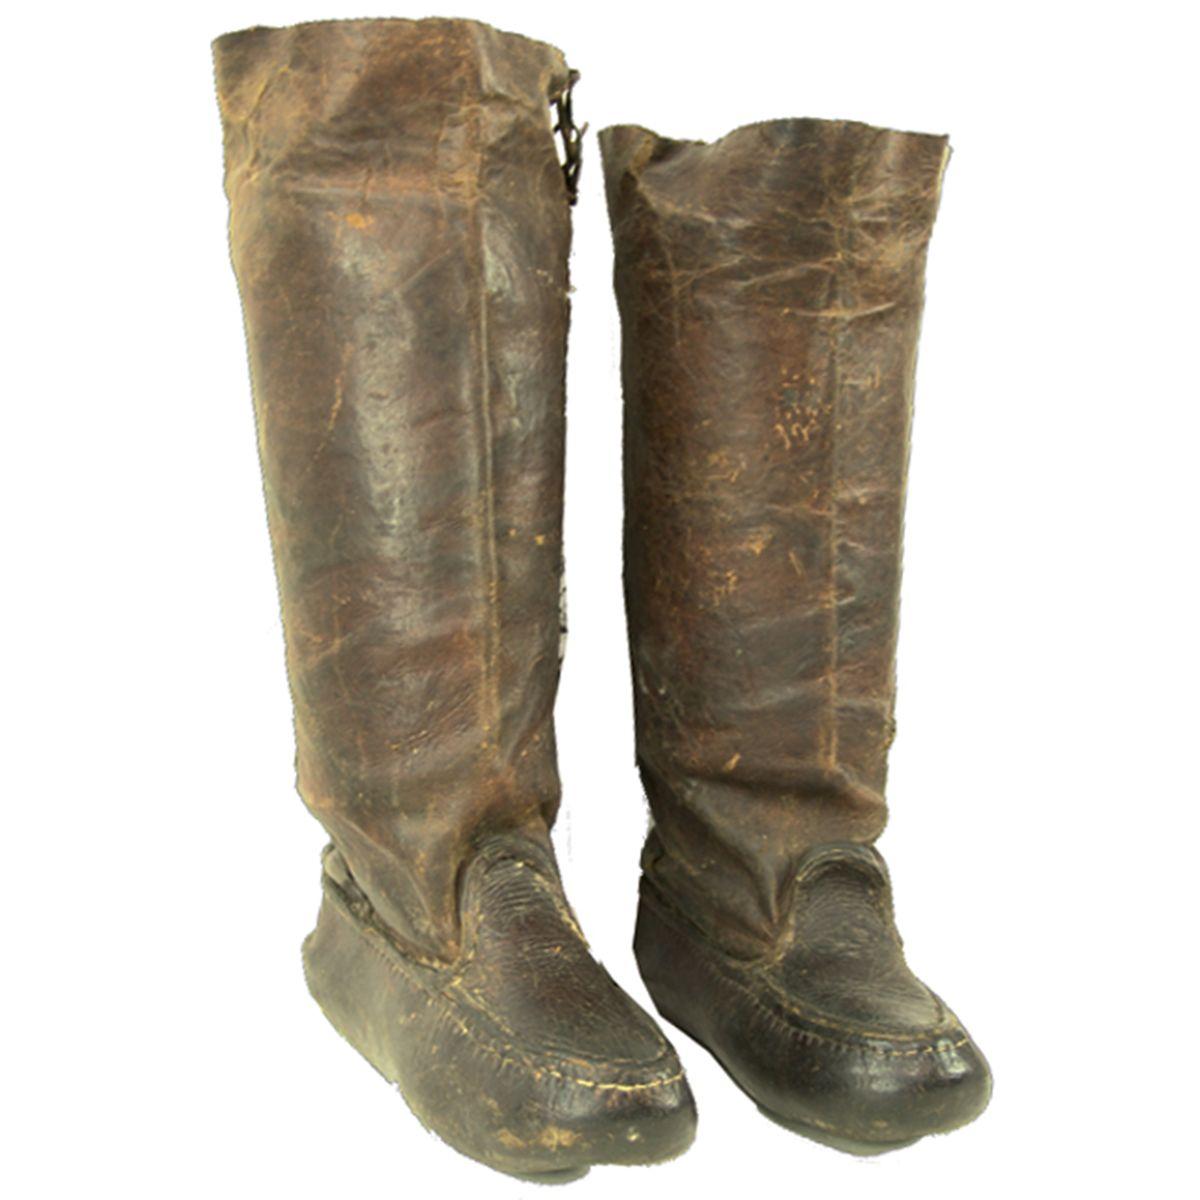 Besarion Jughashvili's Leather Boots